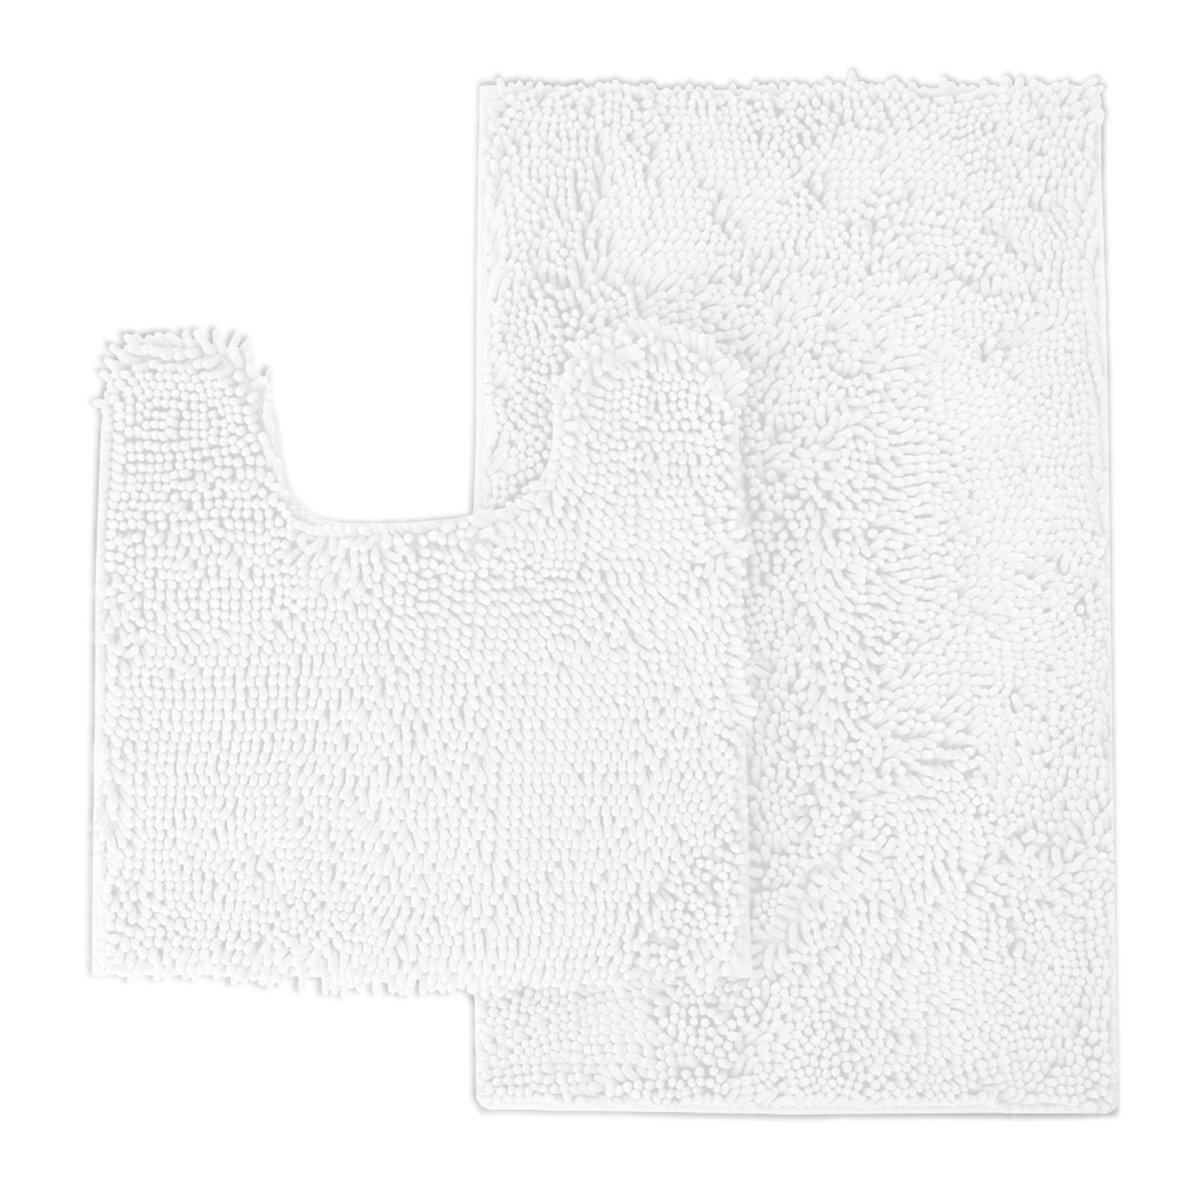 Mayshine 2 Pack (20x31/20x20U inches) Non-slip Bathroom Rug toilet Shag Shower Mat